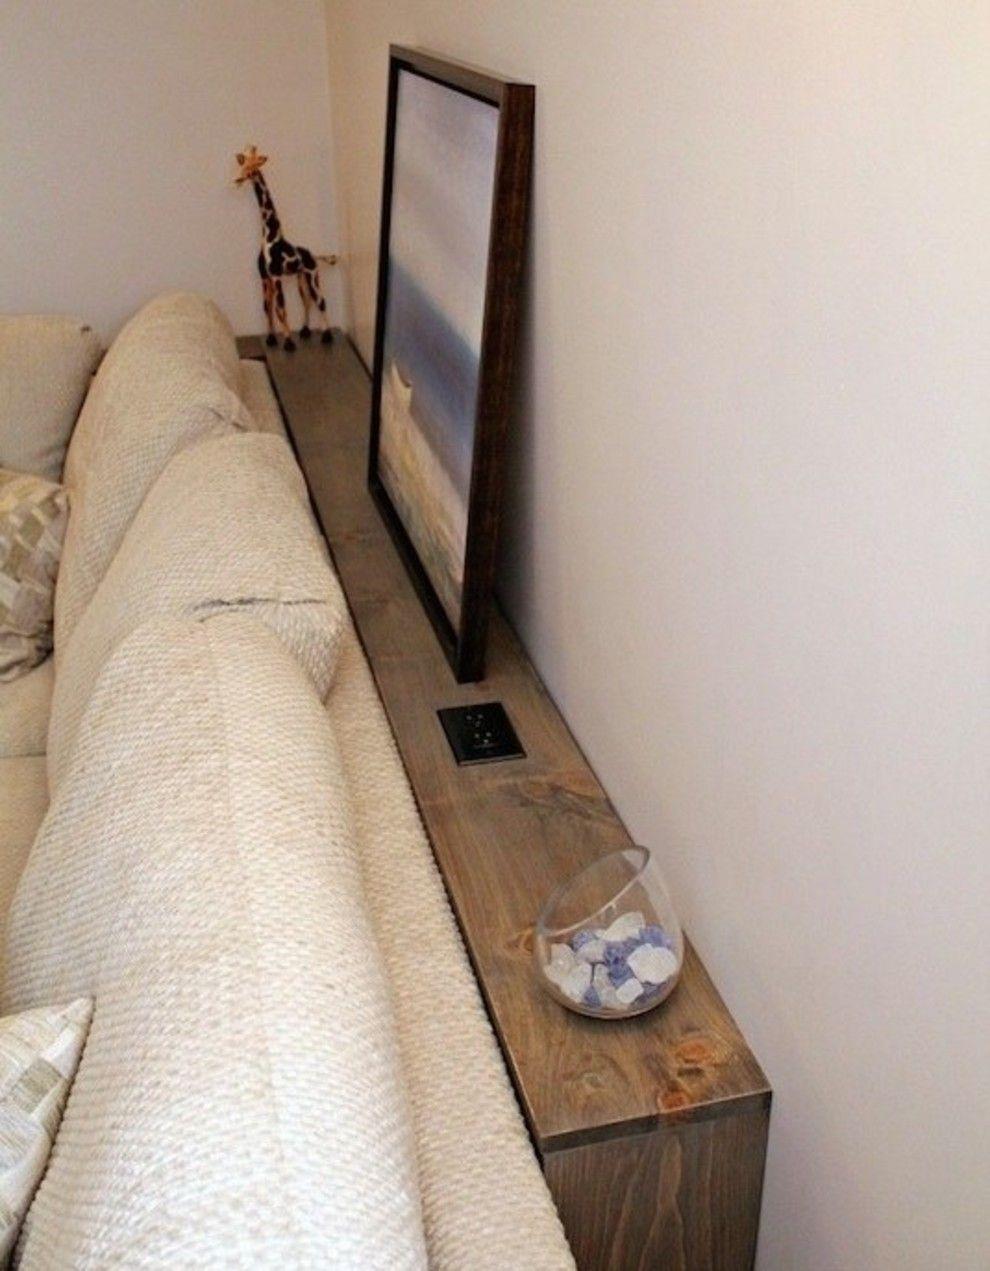 23 Grossartige Einrichtungs Ideen Fur Kleine Raume Diy Sofa Table Diy Sofa Home Diy